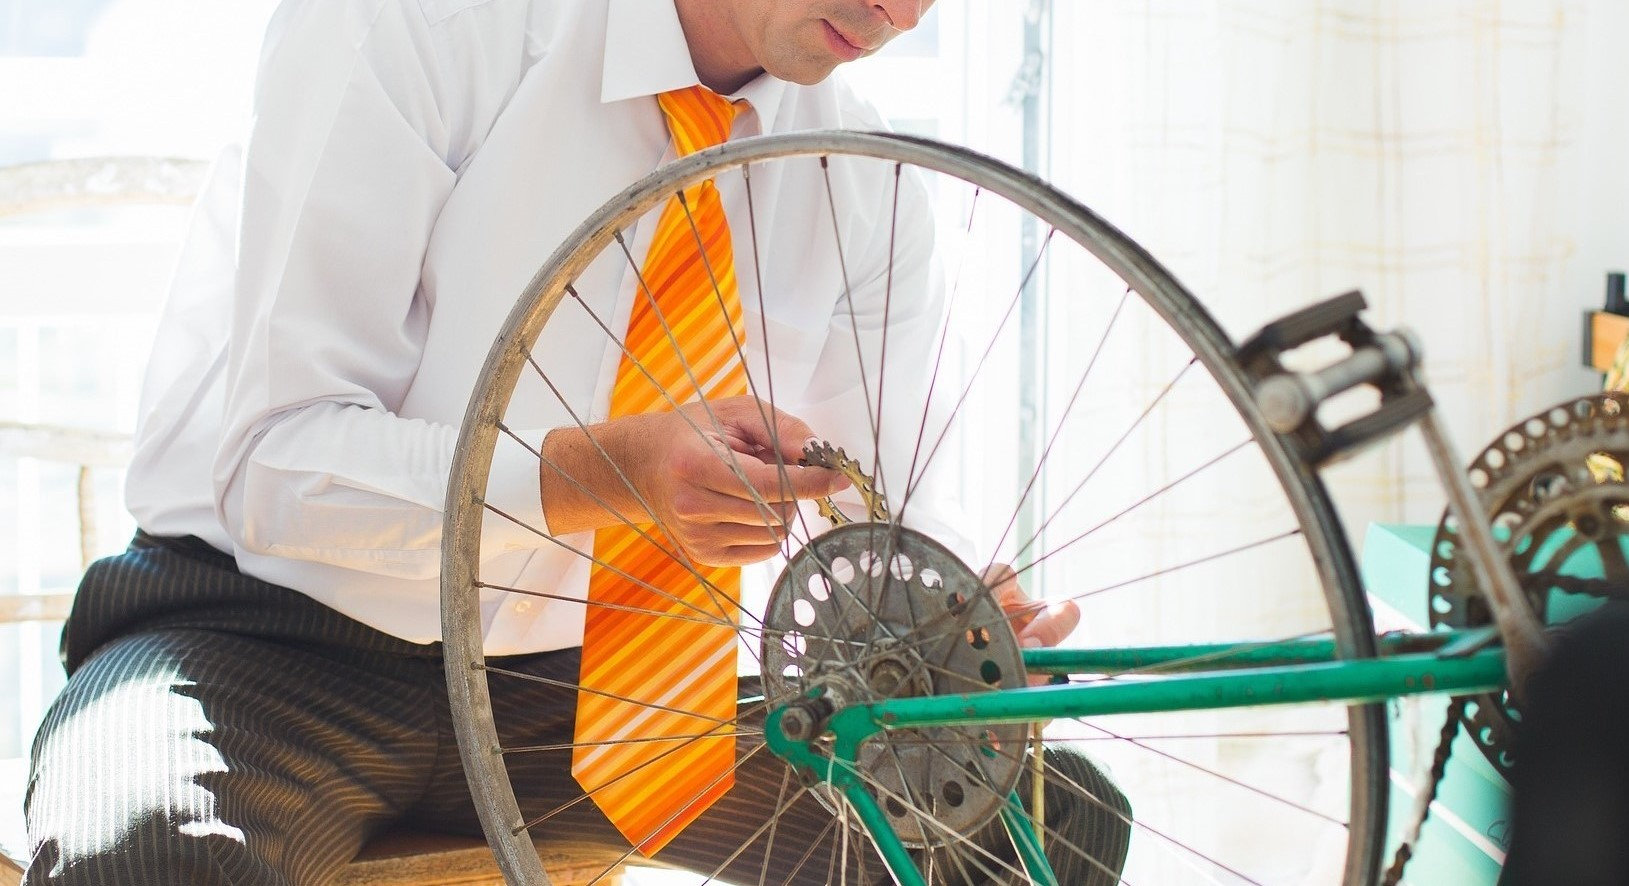 Premium Full bike service